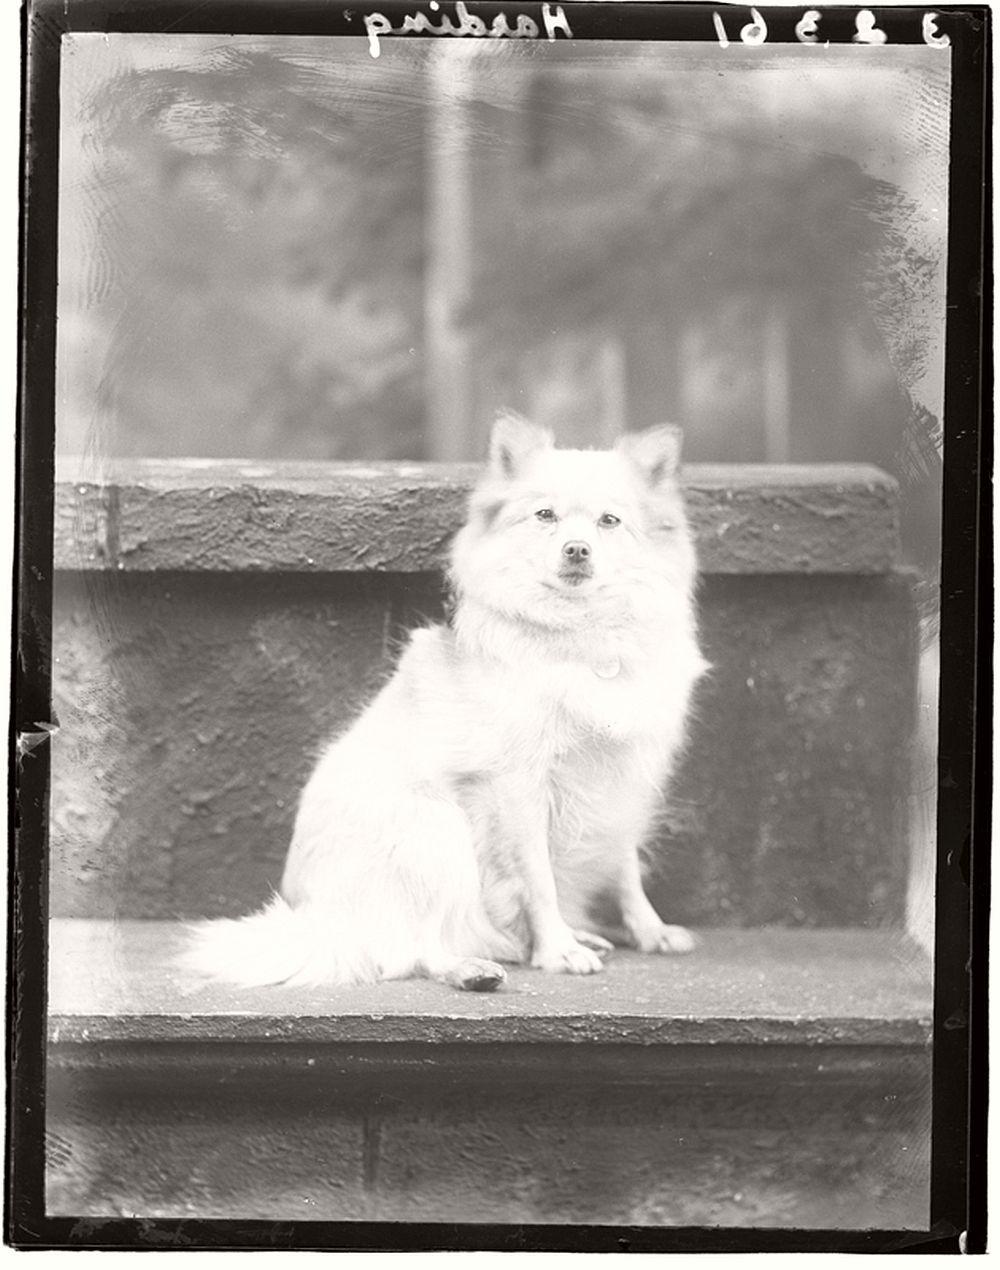 vintage-glass-wet-plate-collodion-portraits-of-pets-1910s-07